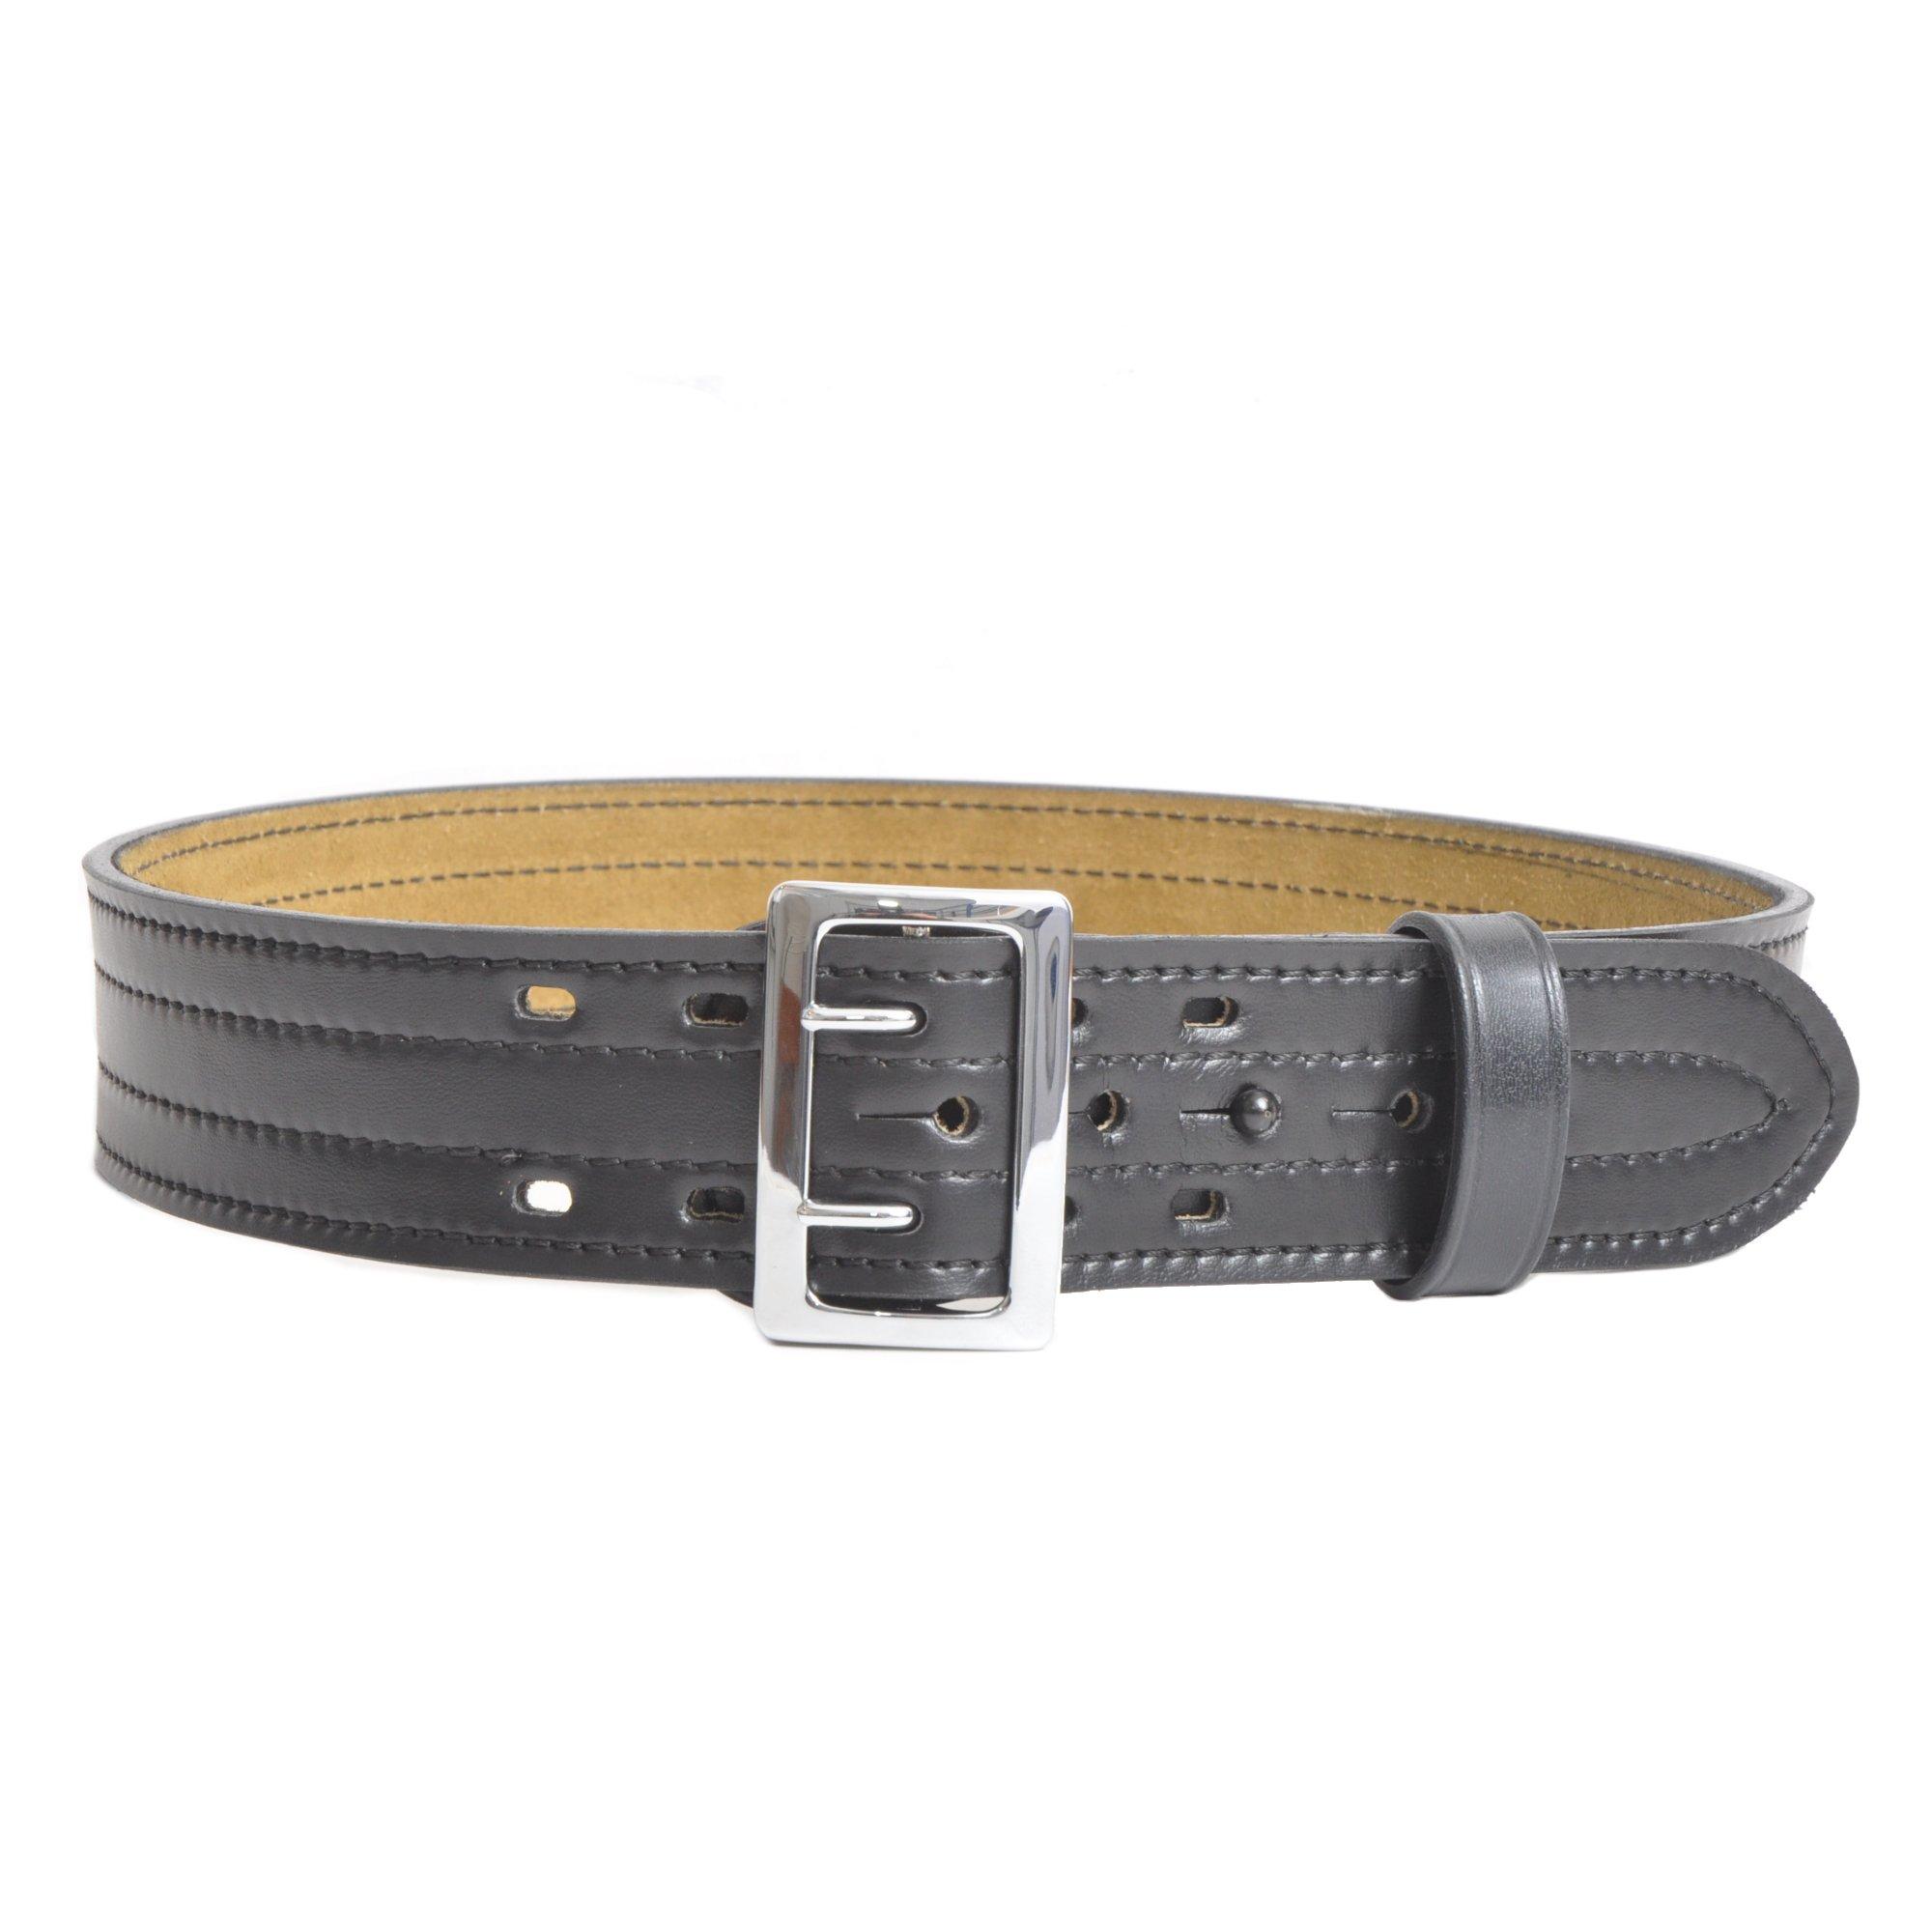 Safariland 87 Duty Belt Plain Black, Chrome Buckle, Size 34